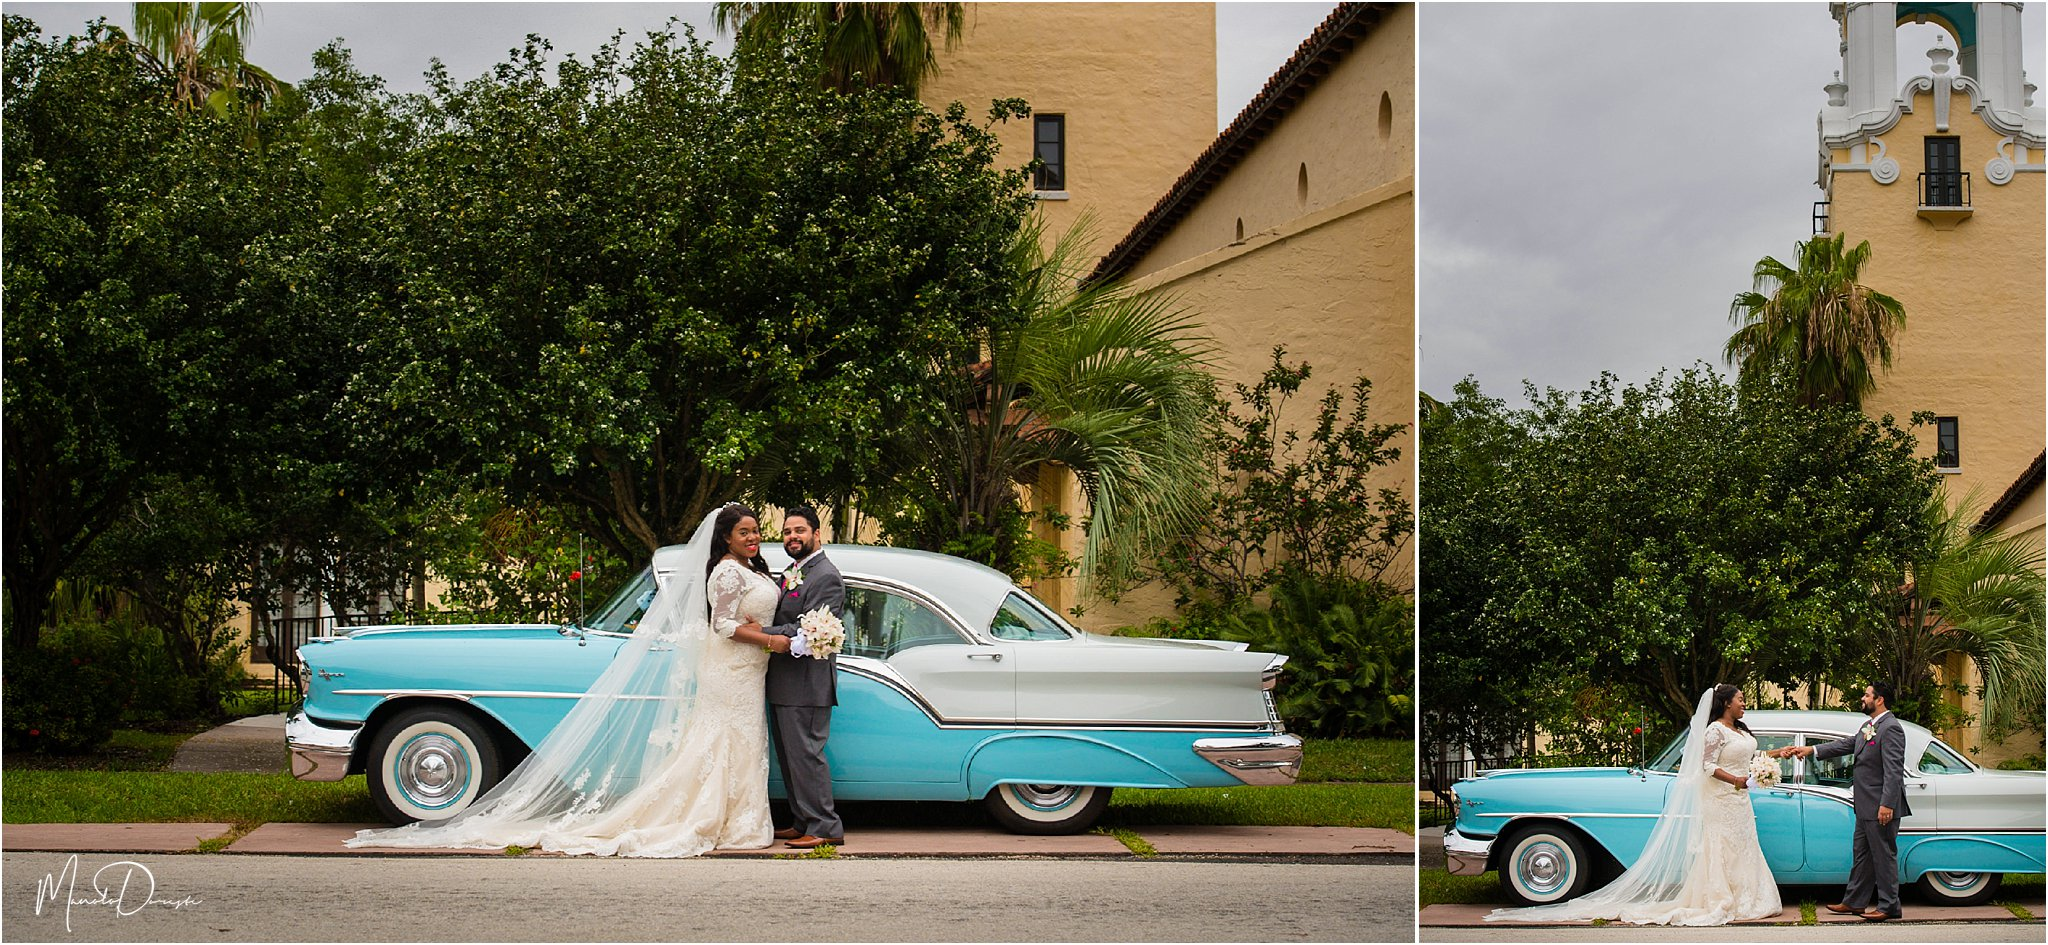 0426_ManoloDoreste_InFocusStudios_Wedding_Family_Photography_Miami_MiamiPhotographer.jpg